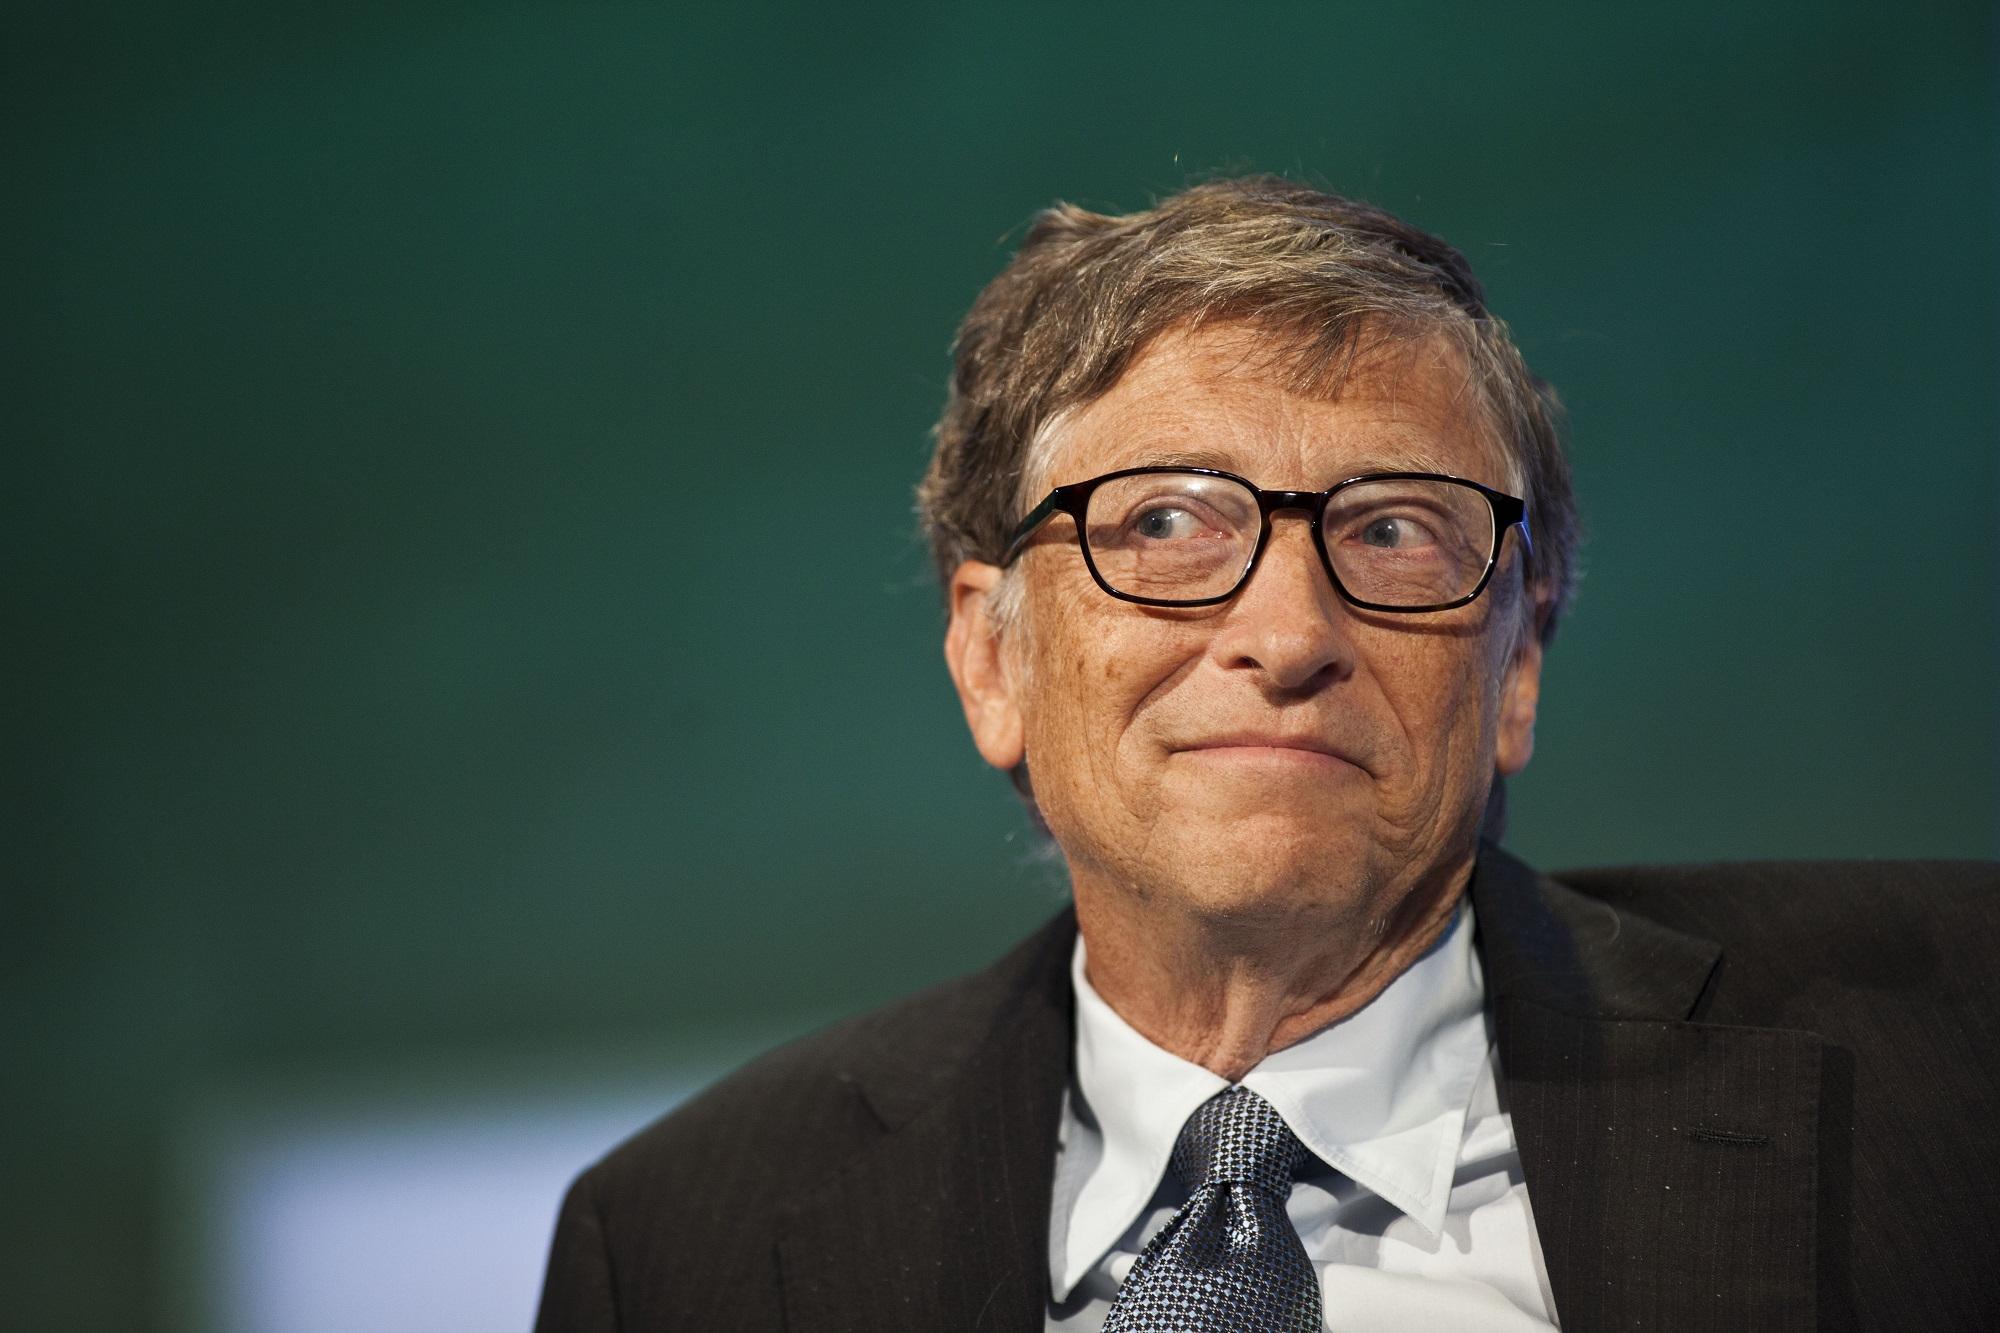 Bill Gates título de mais rico do mundo microsoft filantropia